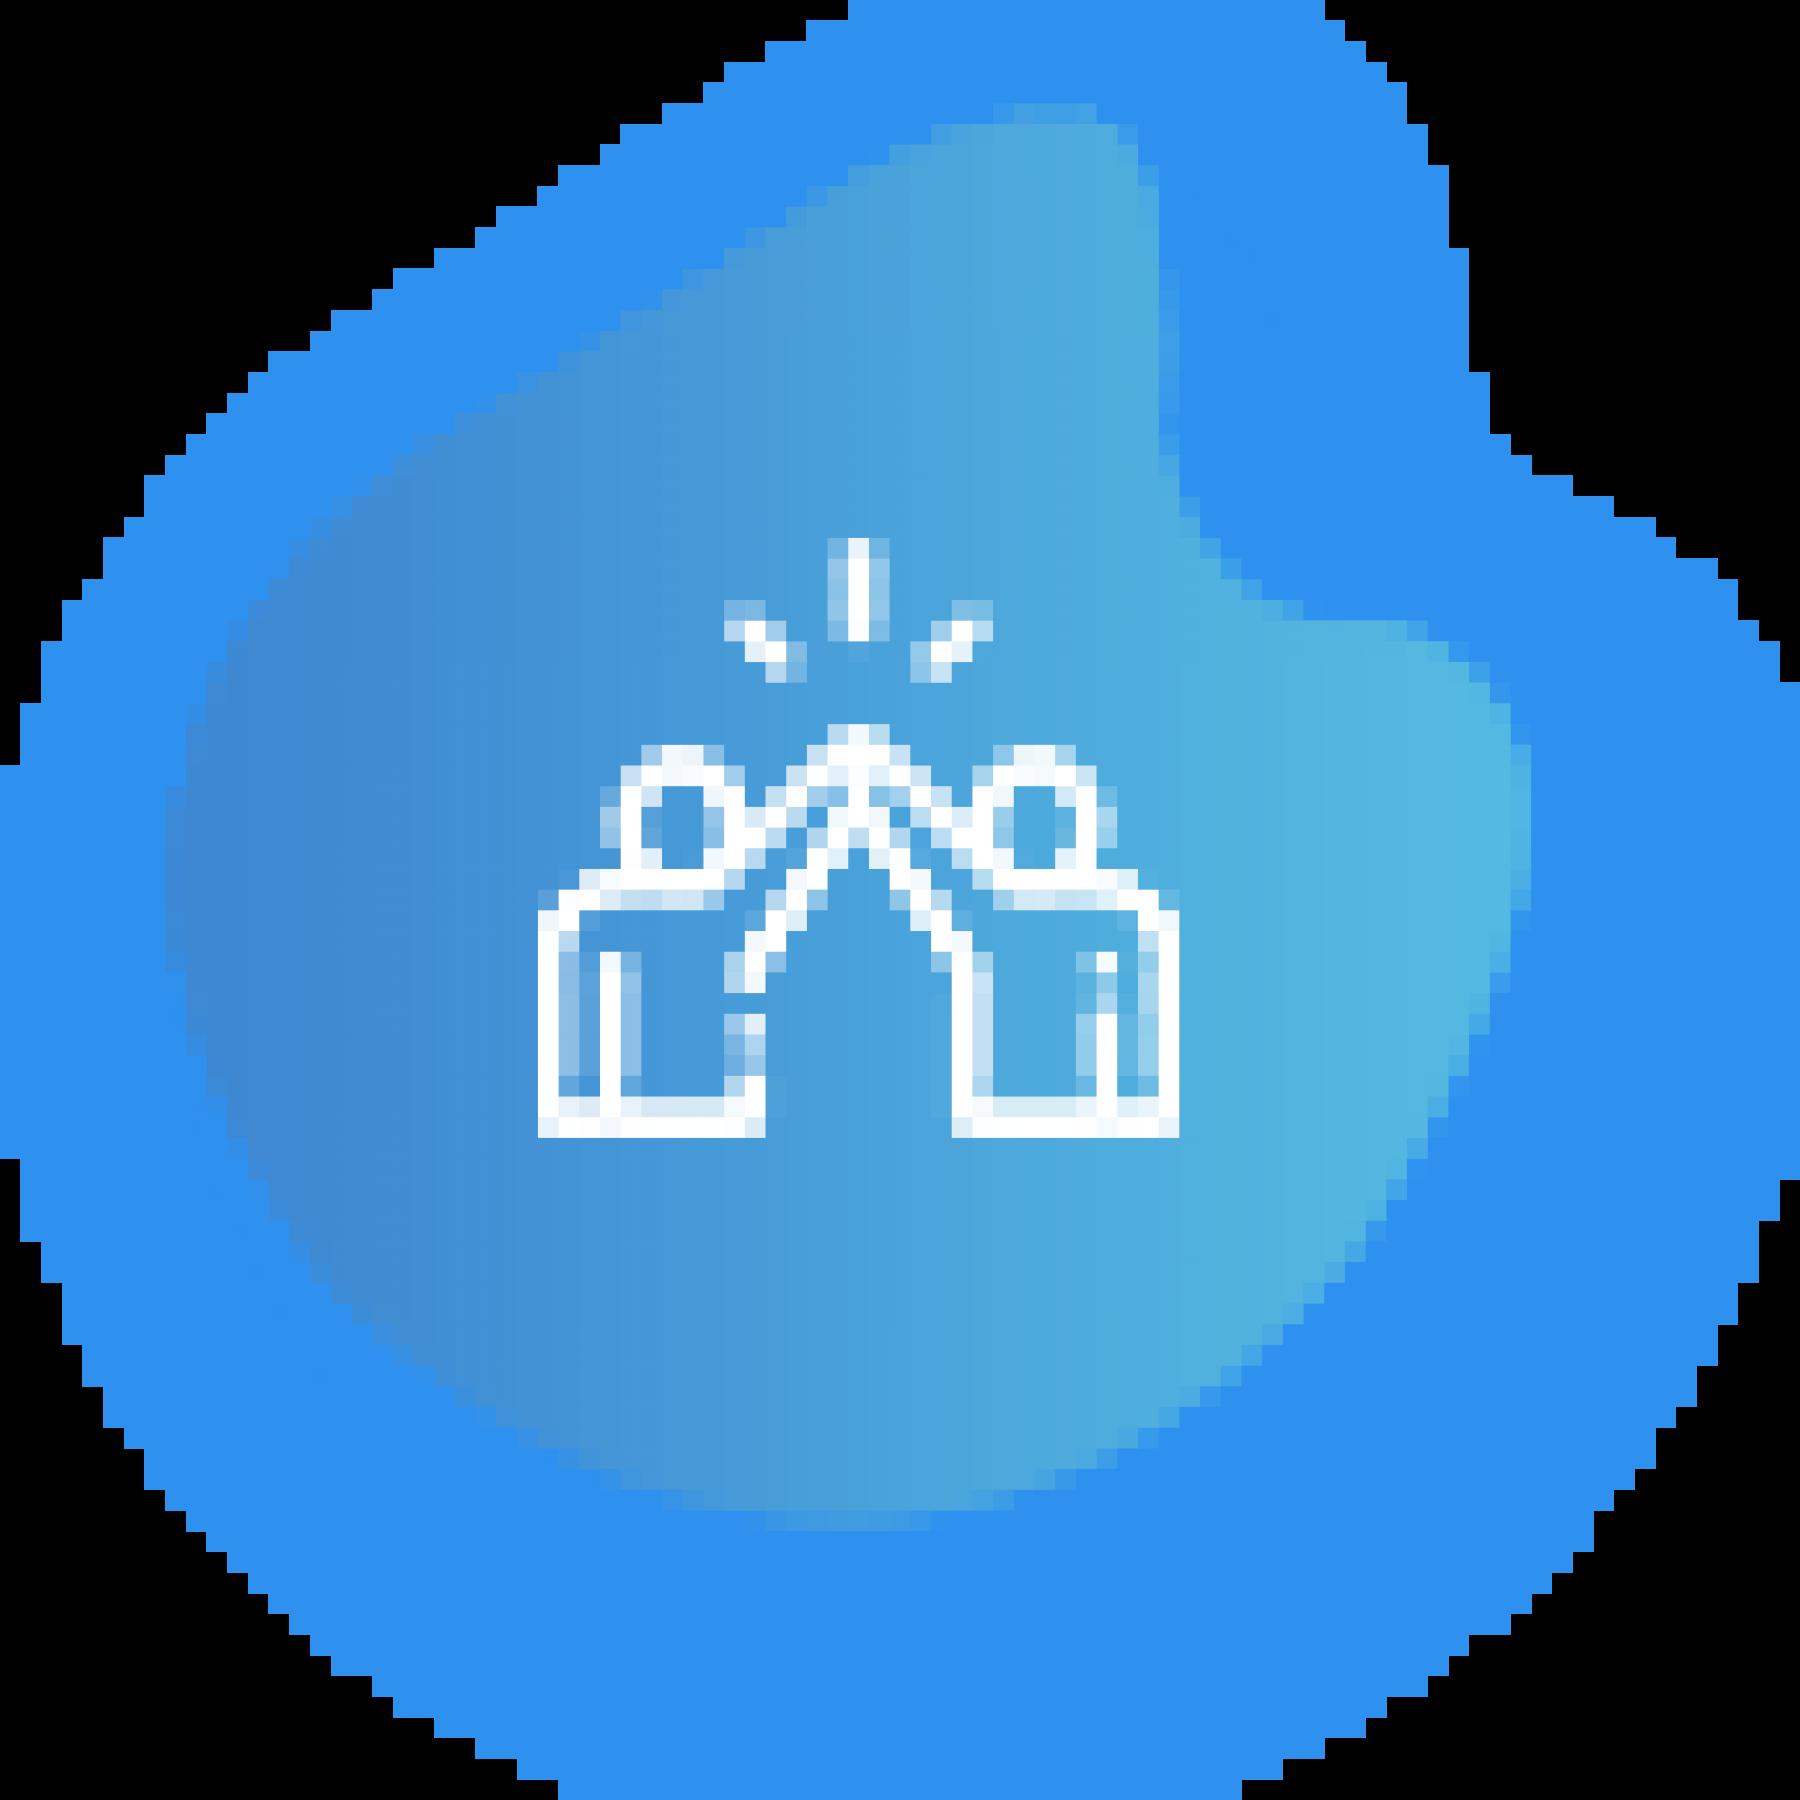 home-version-three-revenue-traffiic-icon2